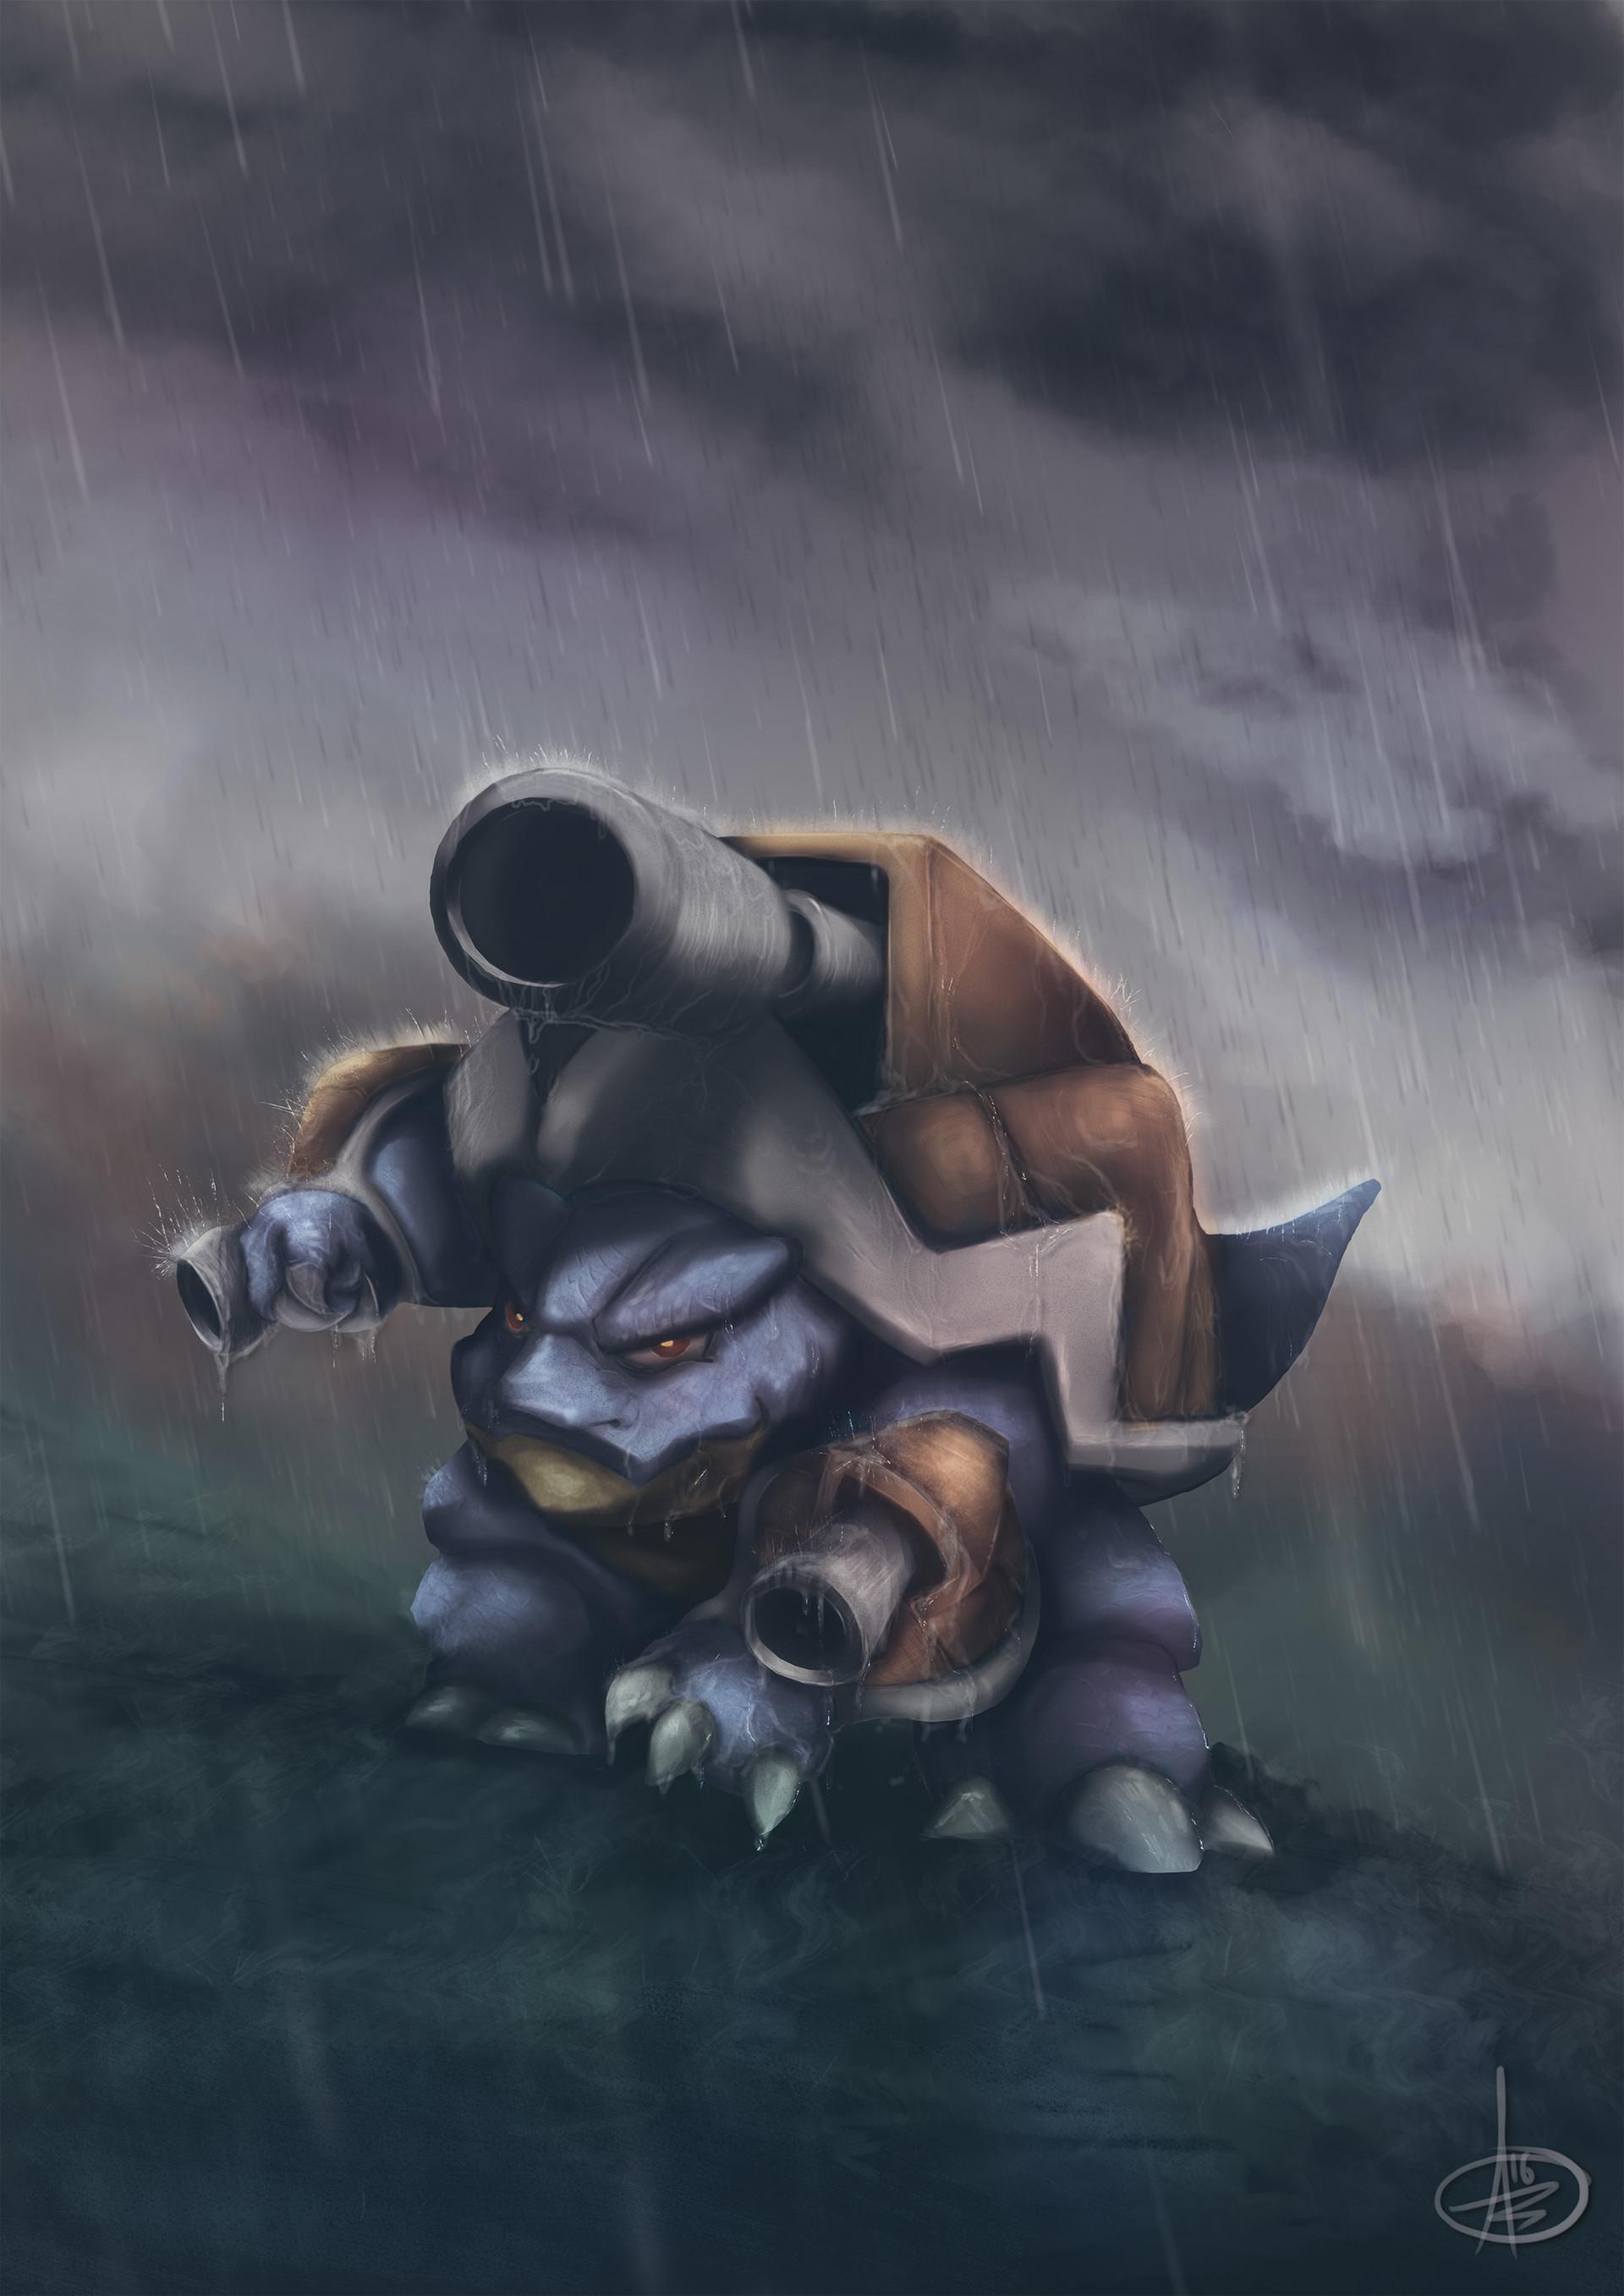 Ảnh Pokemon Mega Blastoise đẹp